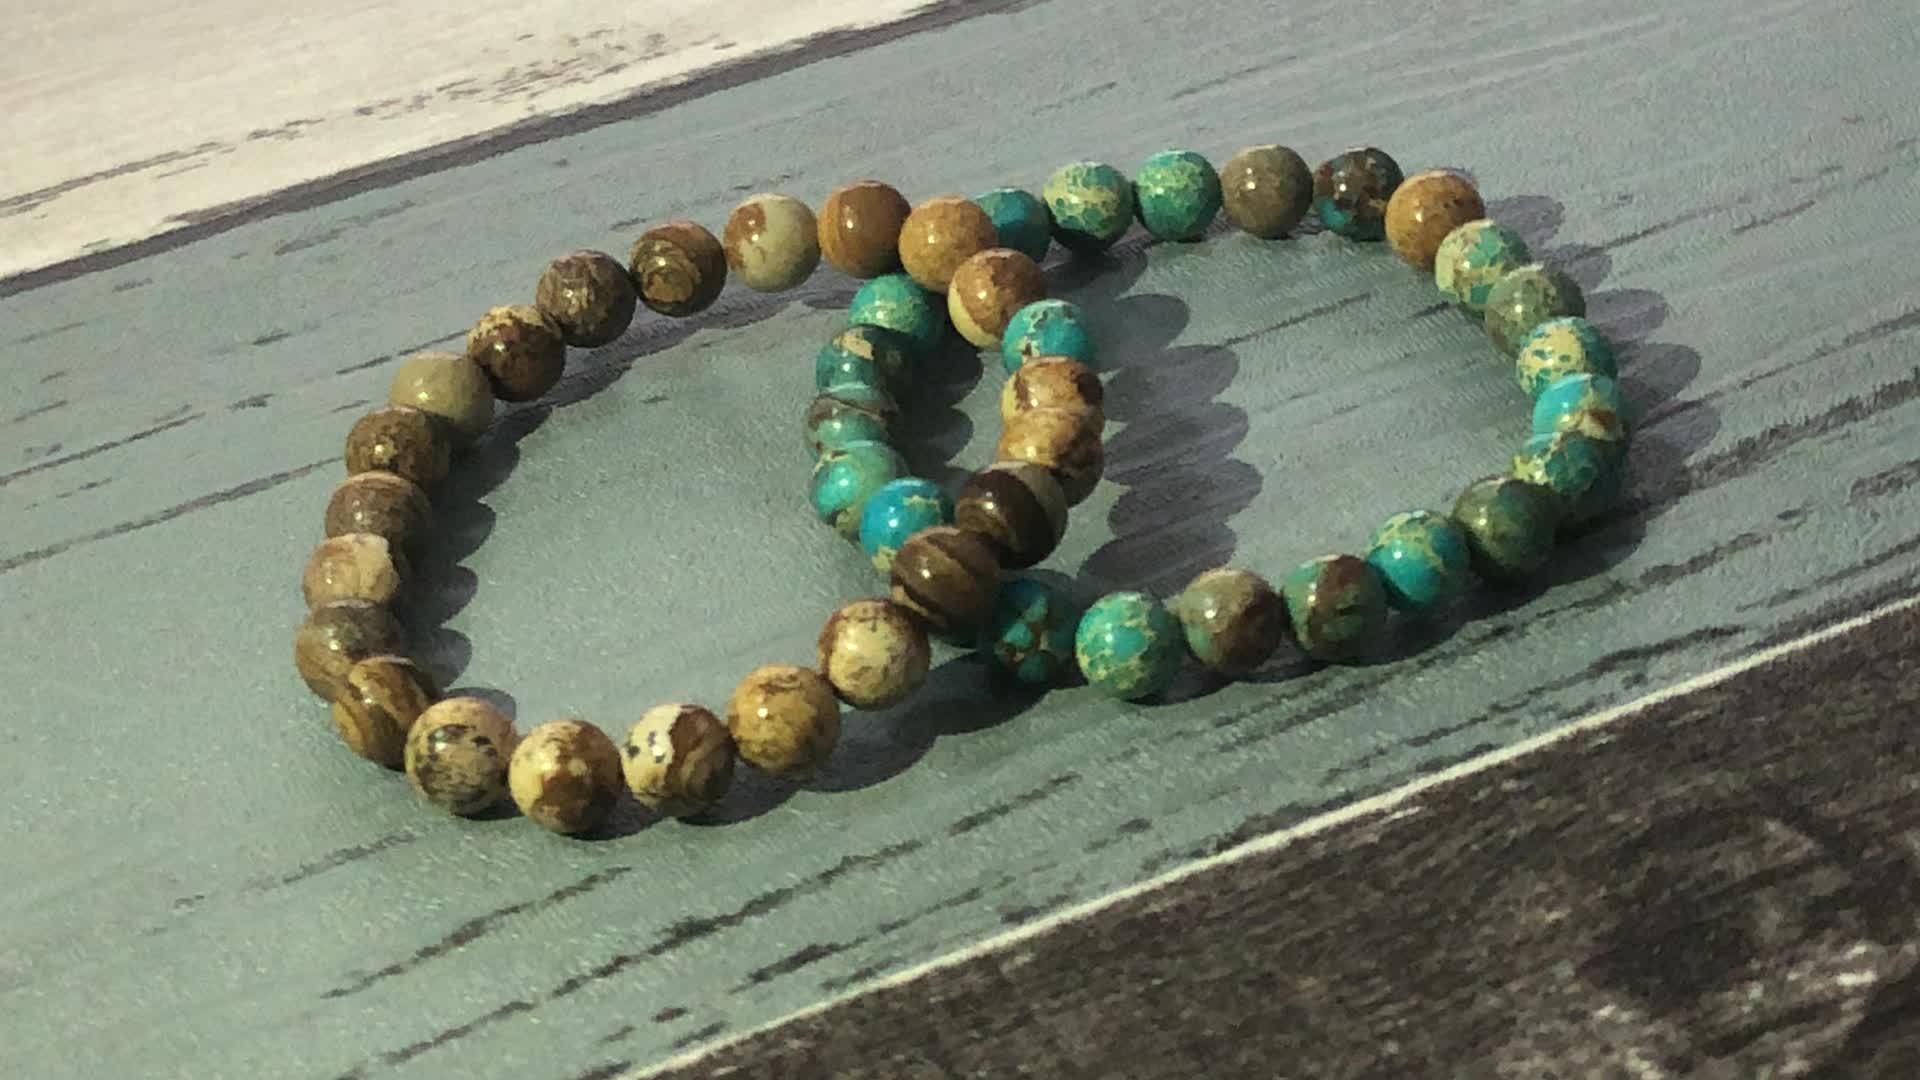 SN1738 Yoga Meditation Healing Jewelry For Men Gift Buddha Bracelet Mens Red Carnelian & Emperor Jasper Mala Beads Bracelets